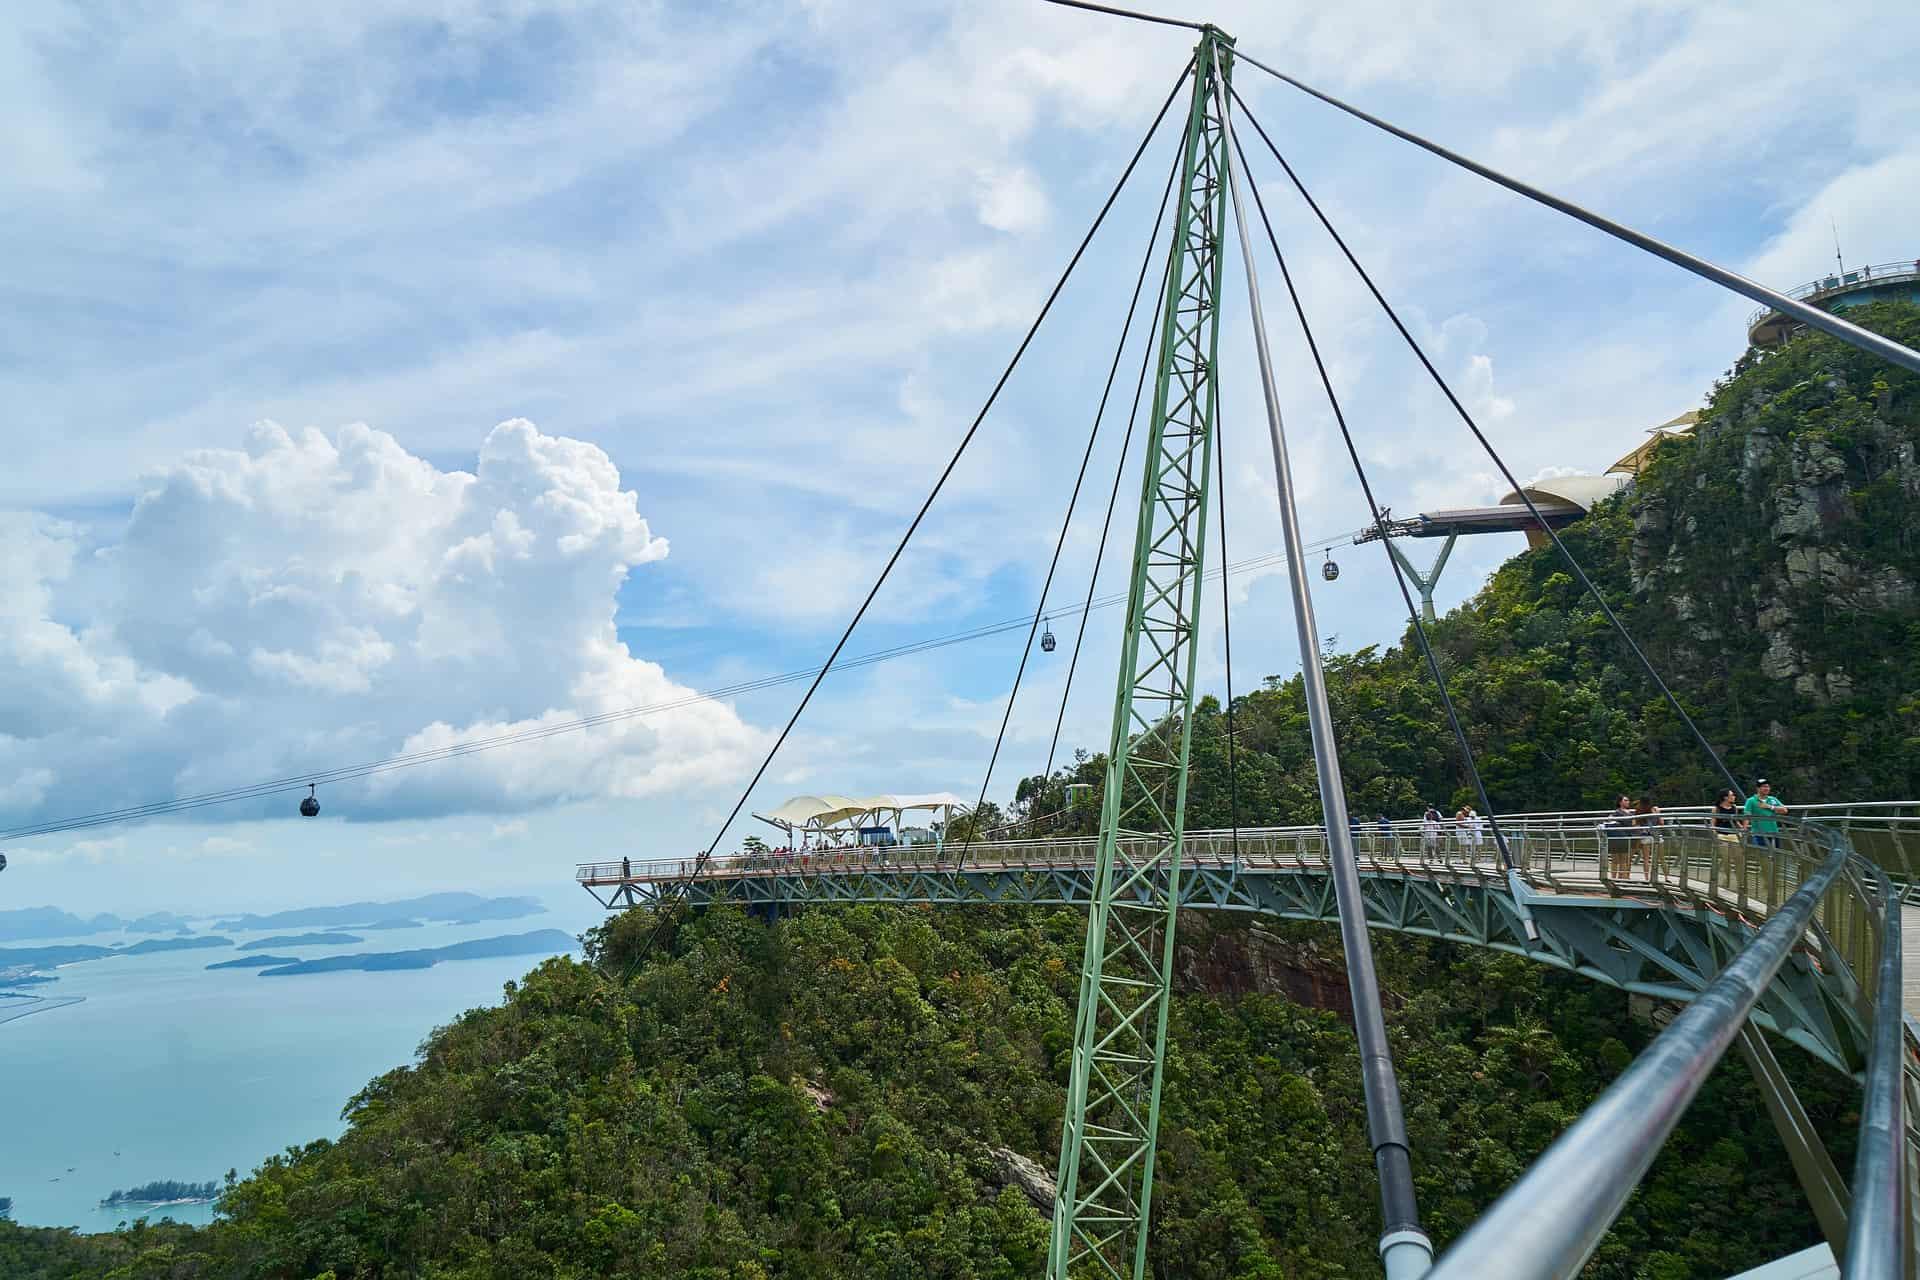 Malaysia Rundreise ab Kuching günstig ab 269,00€ 4 Nächte